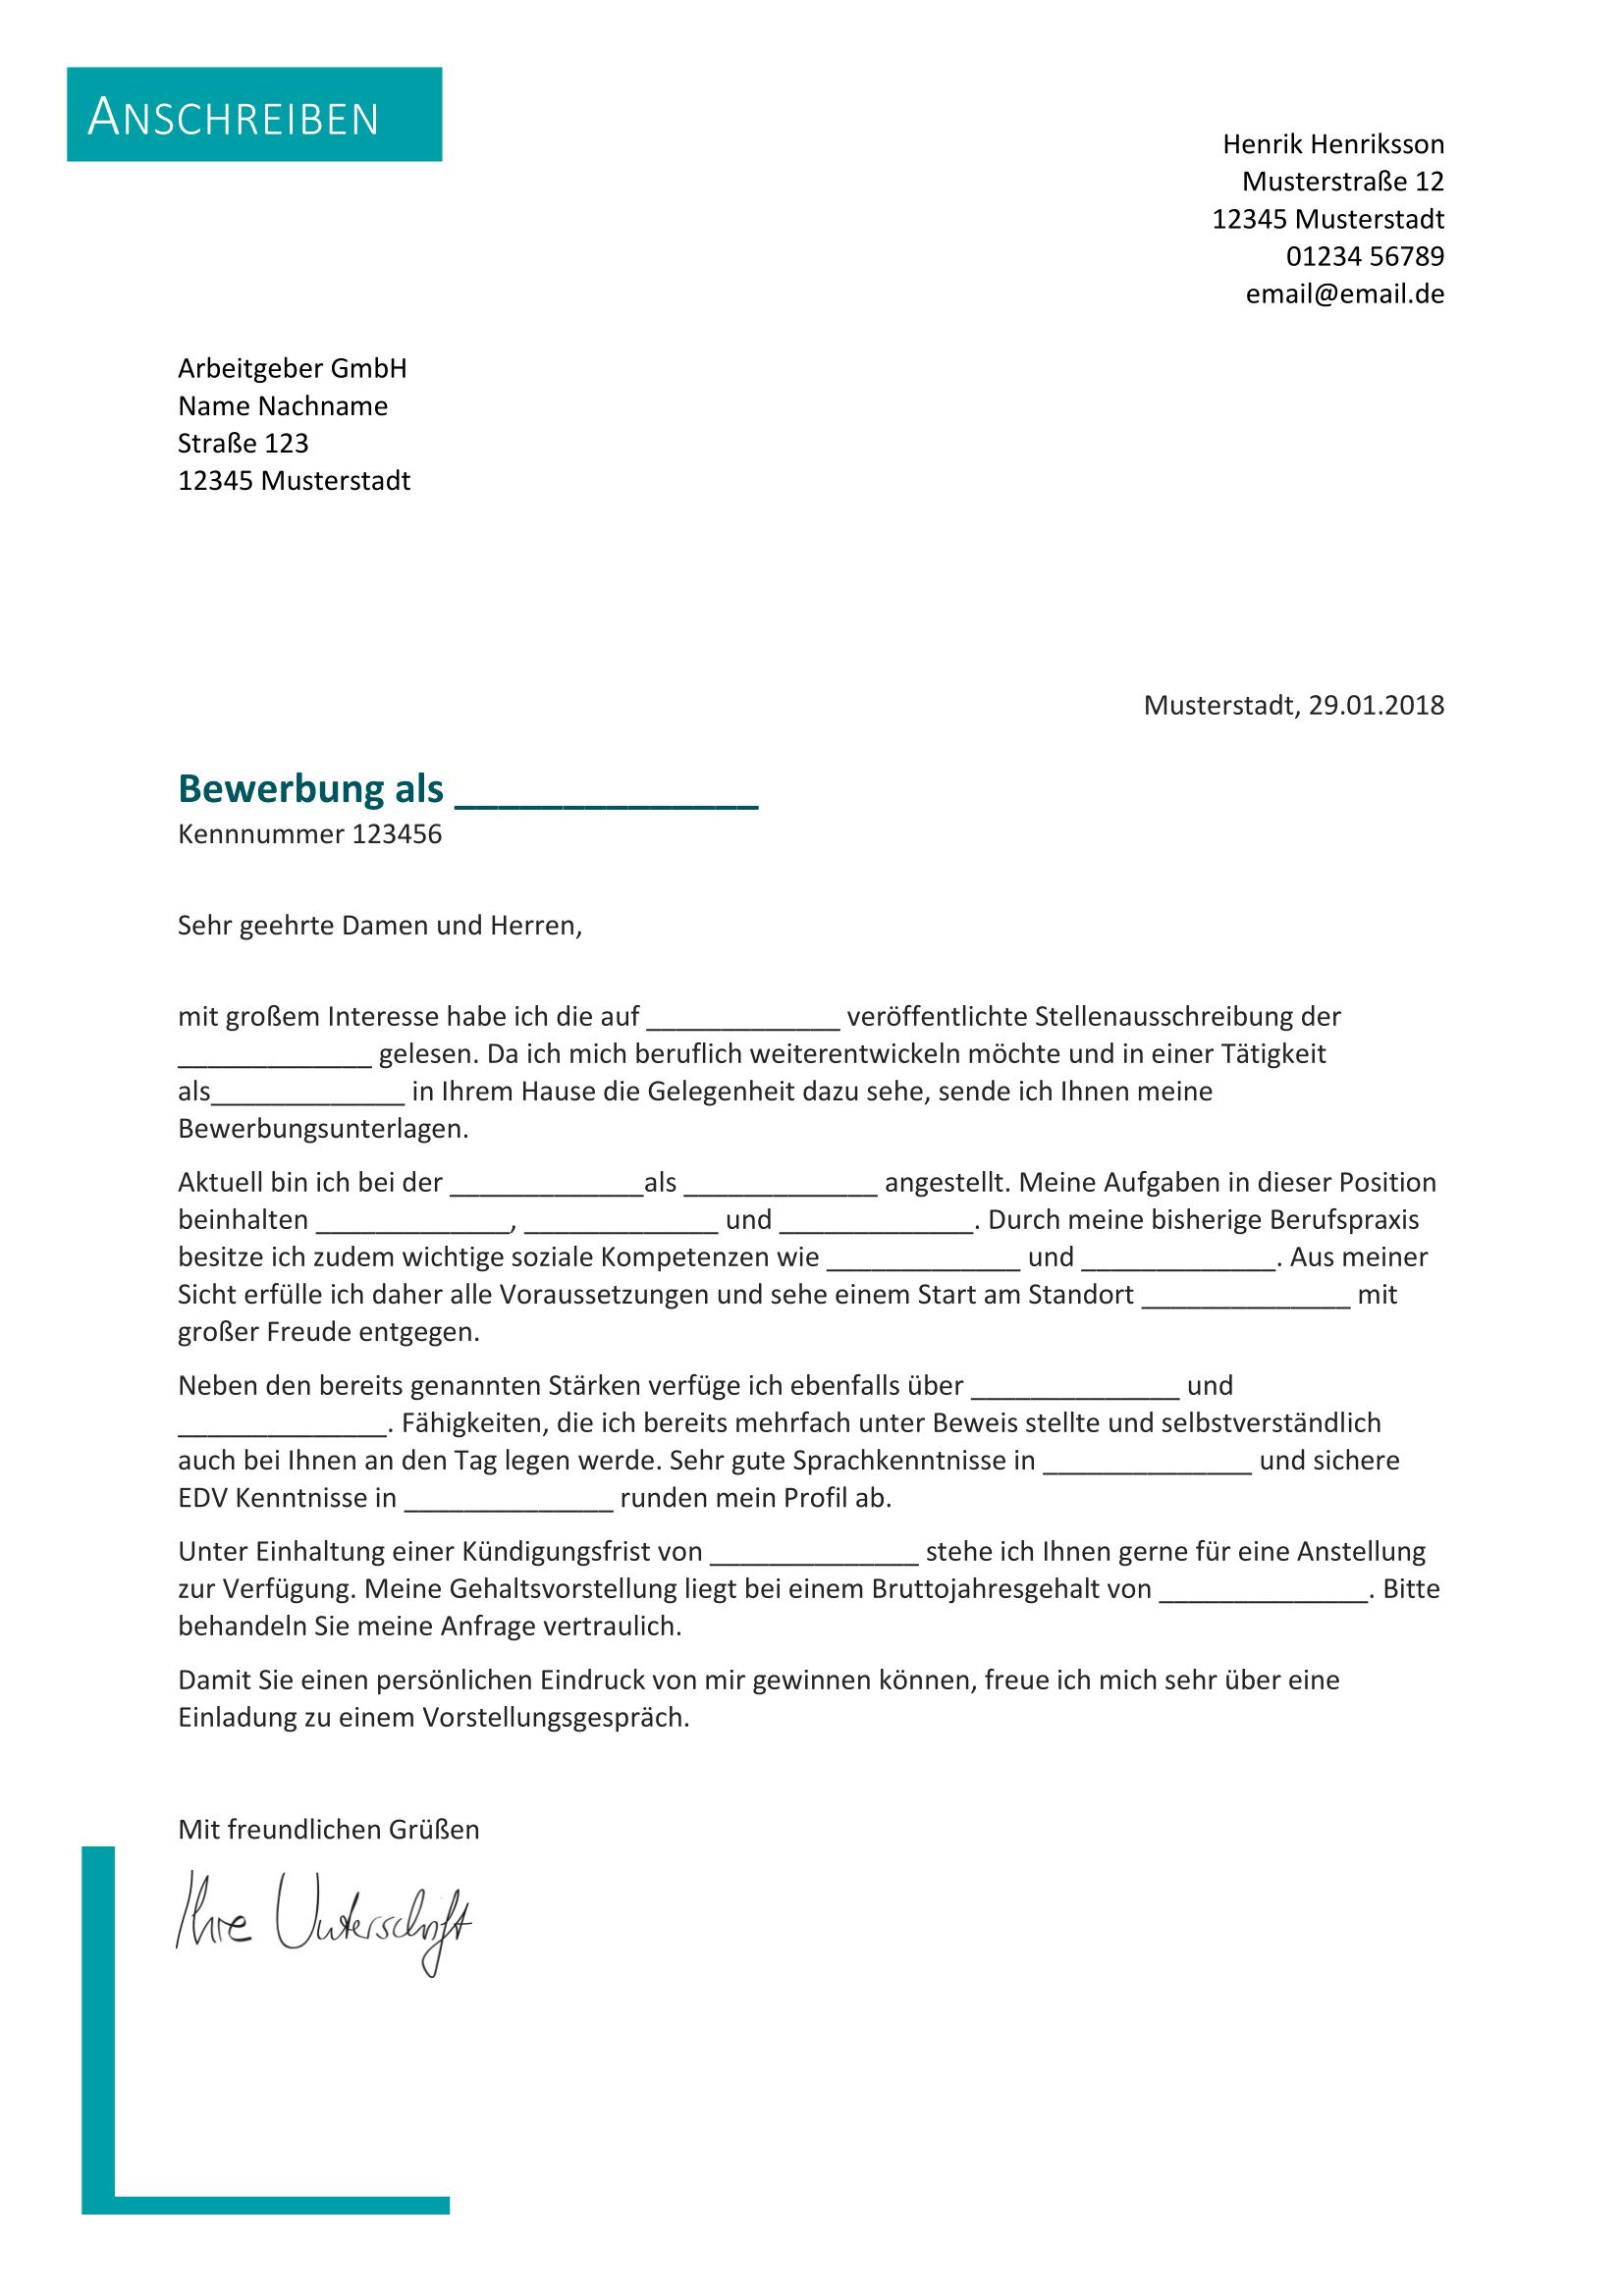 Briefprobe Briefformat Briefvorlage Bewerbung Schreiben Bewerbung Anschreiben Muster Vorlage Bewerbung